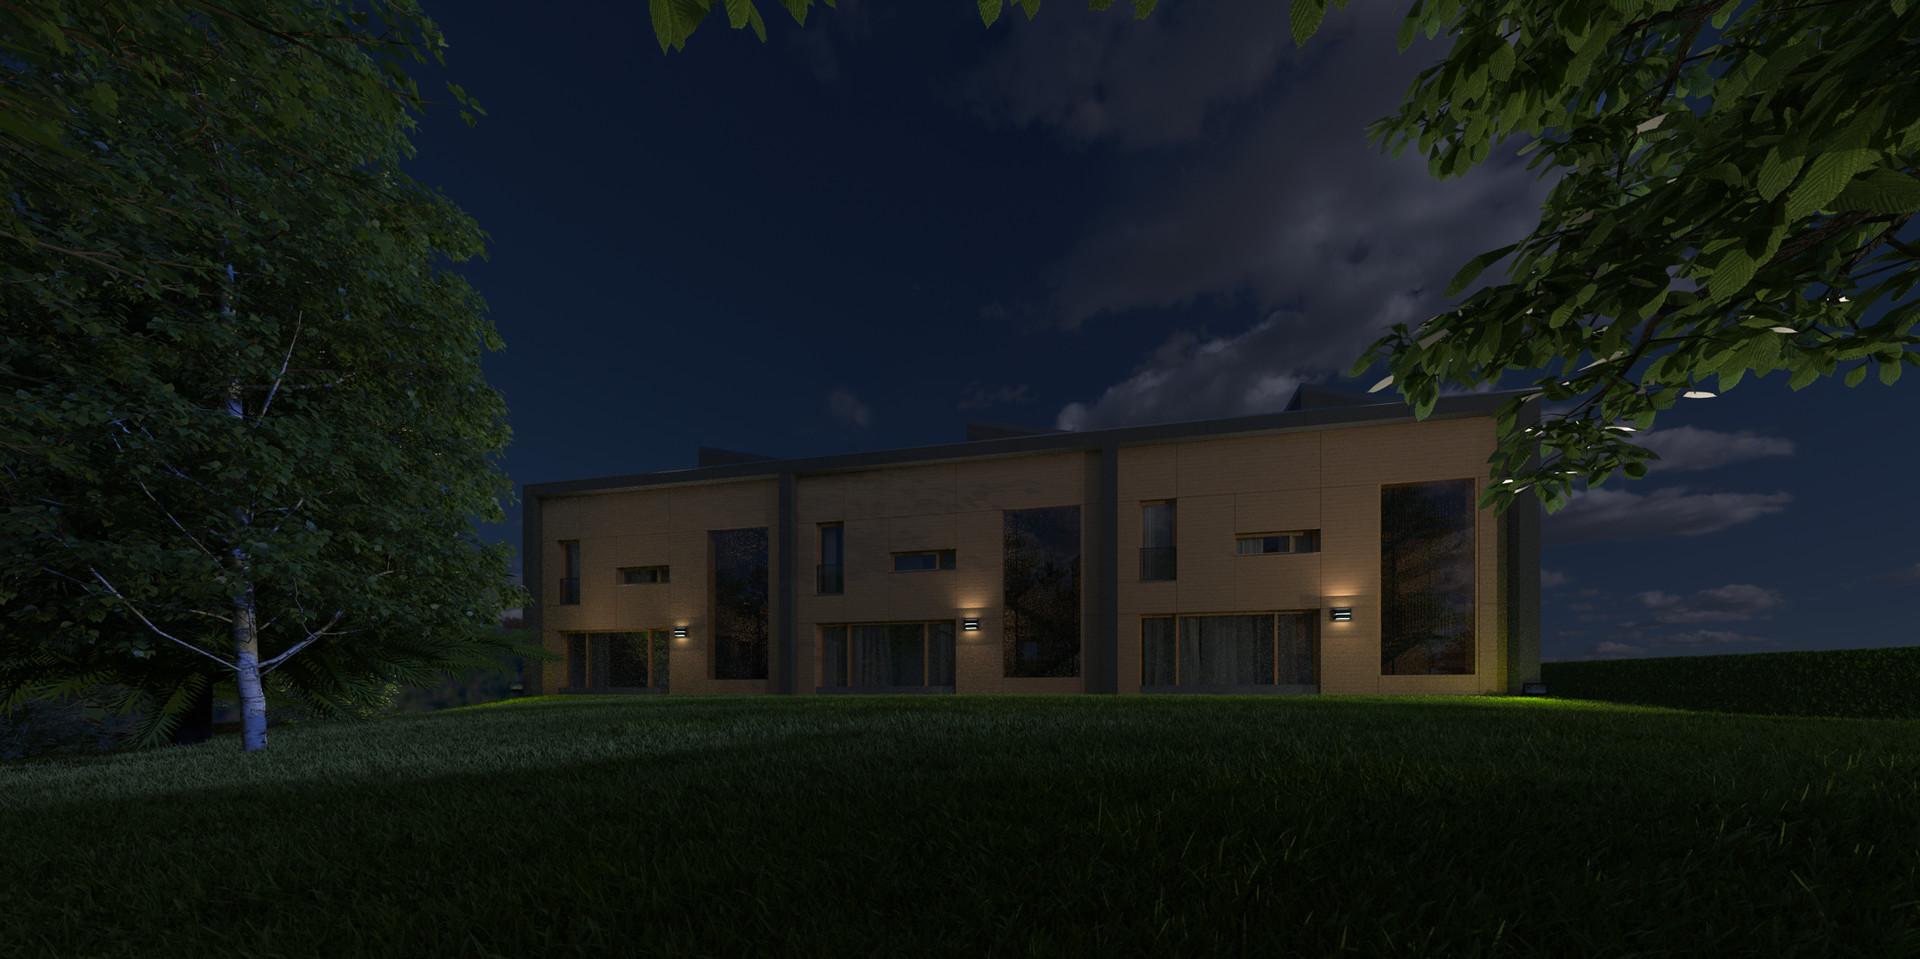 Duane kemp 06 exterior n ground new 03b night a